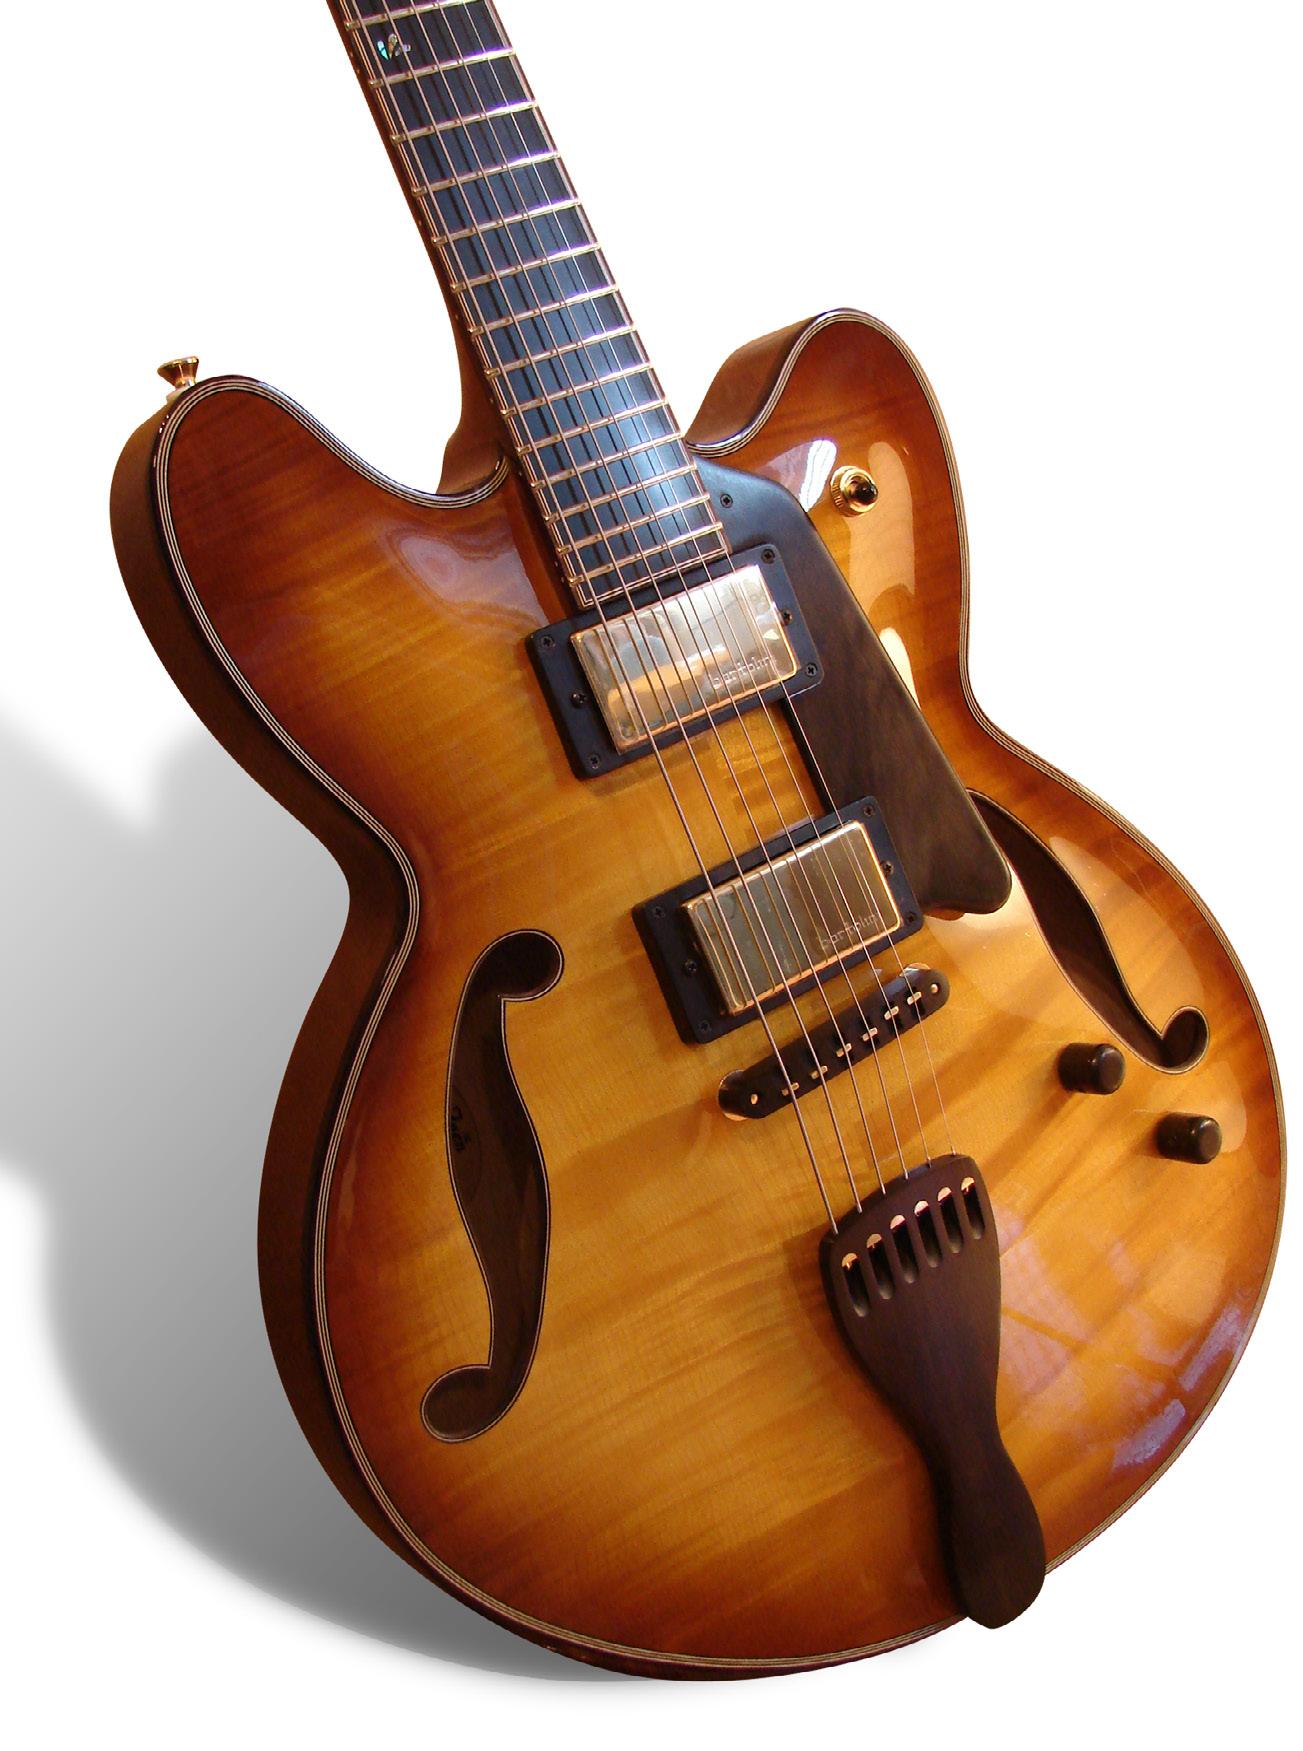 steel string guitar construction irving sloane pdf